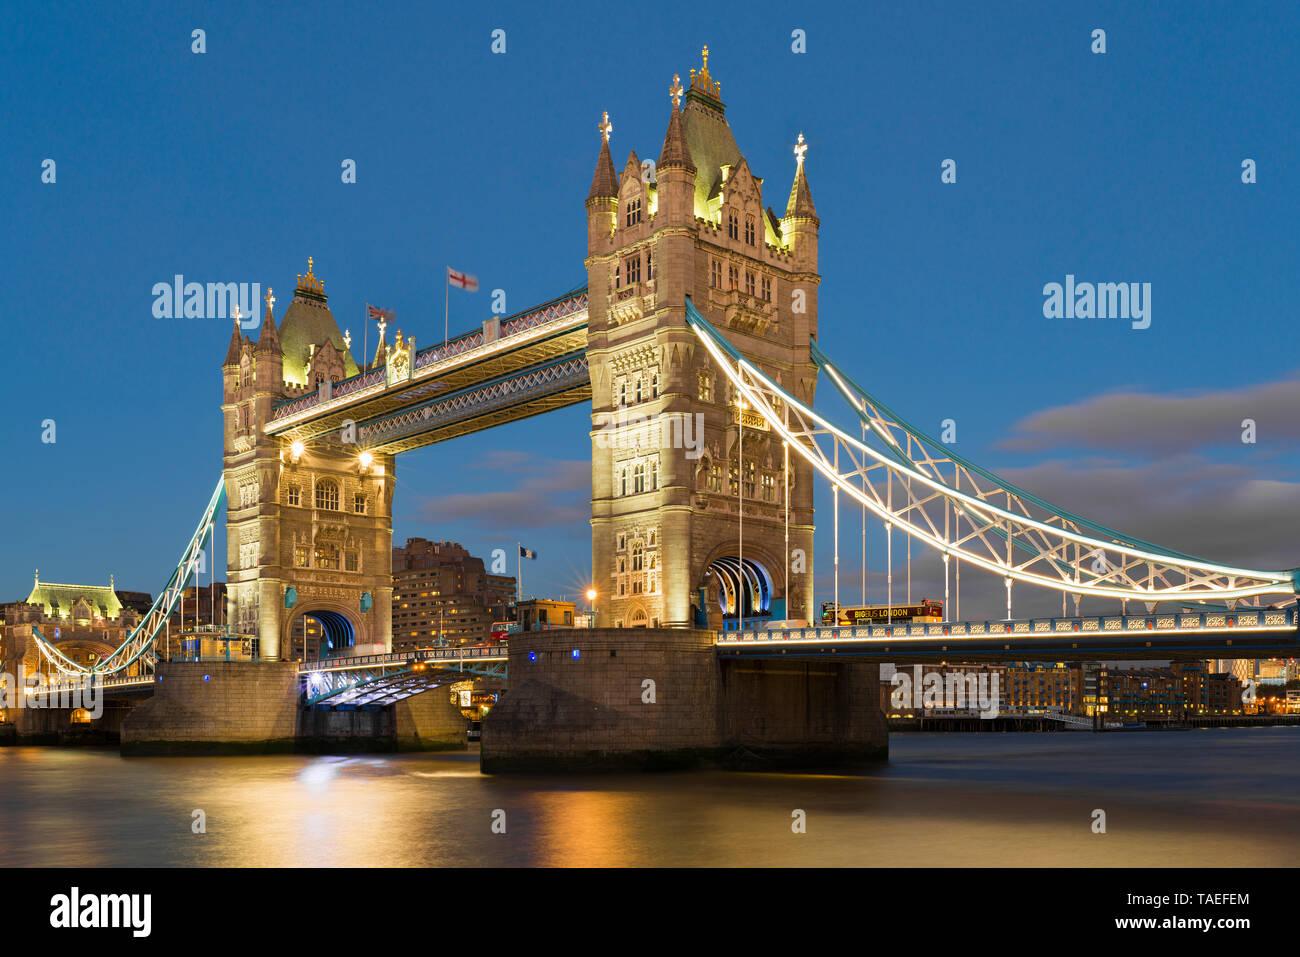 UK, London, Tower Bridge at night Stock Photo